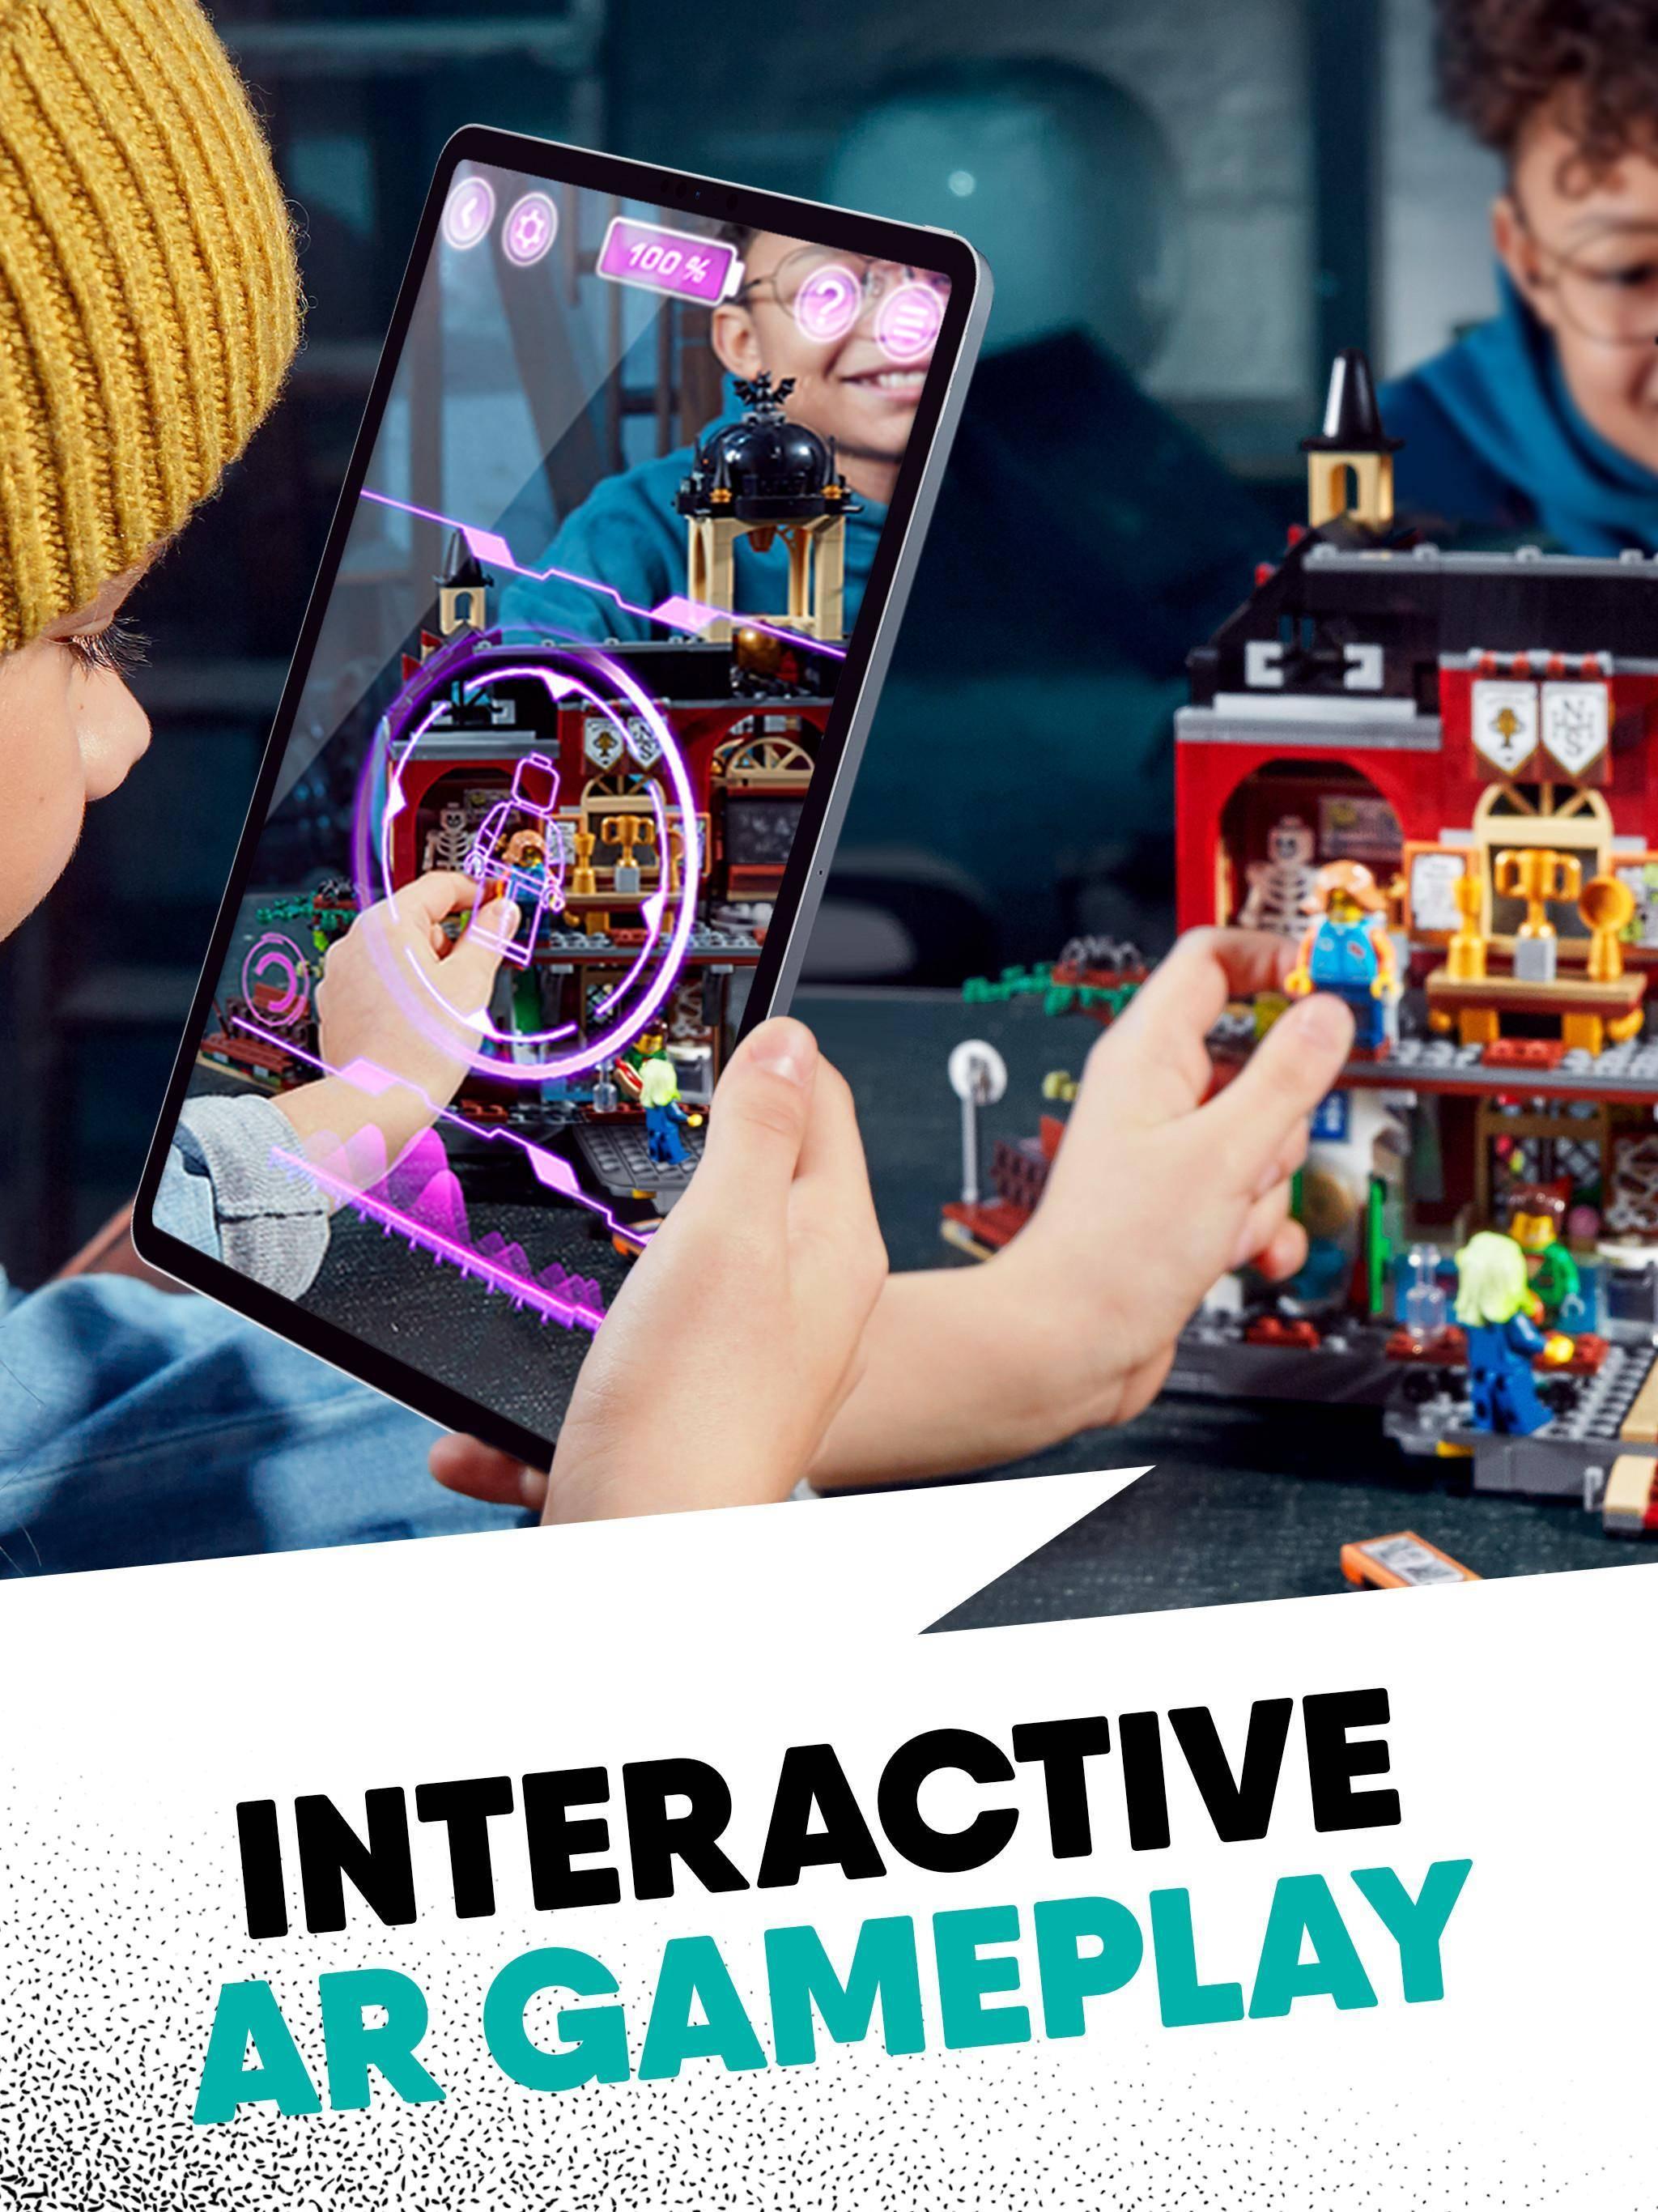 interactive ar gameplay